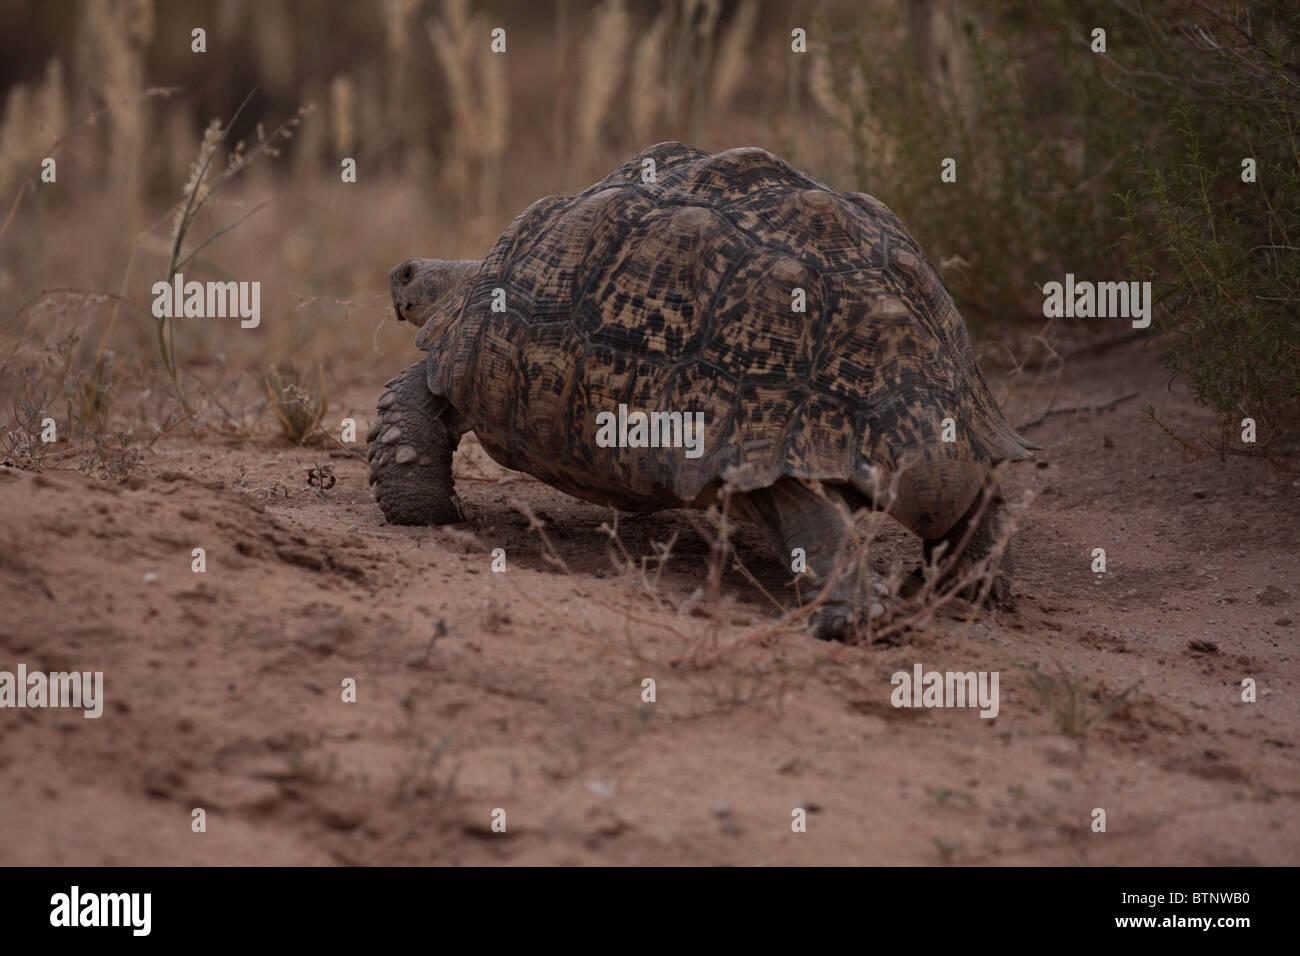 a tortoise walking on sand in the kalahari desert - Stock Image